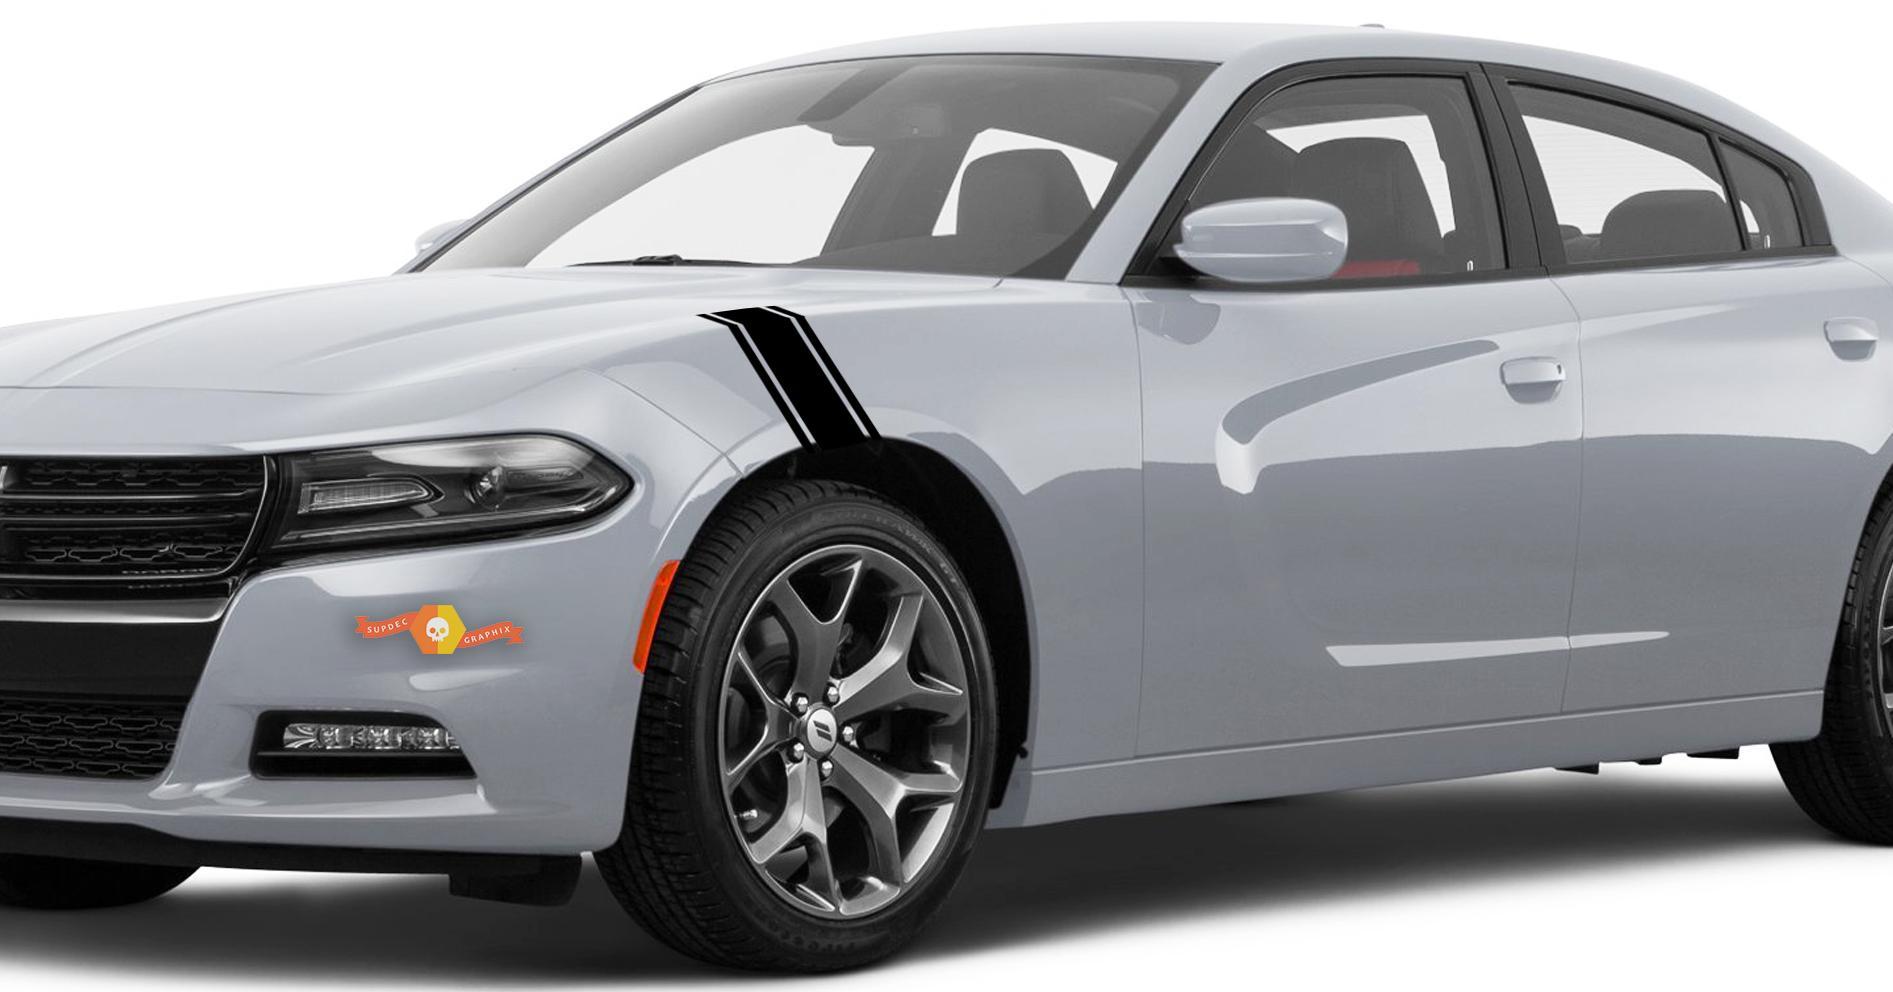 Komplettes Kit mit Aufklebern Decas kompatibel mit Dodge Charger No154